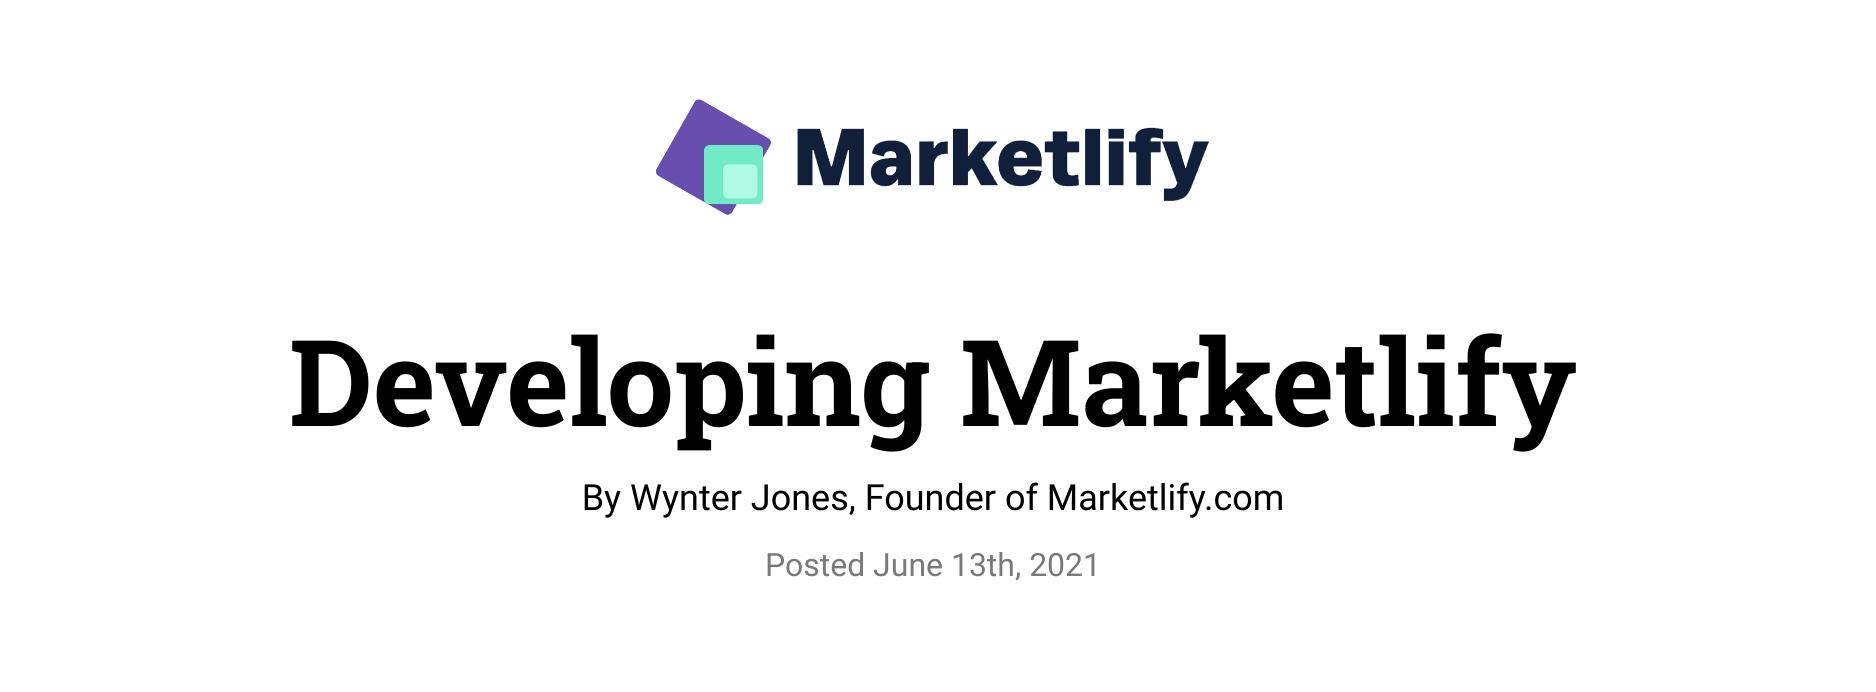 Developing Marketlify by Wynter Jones